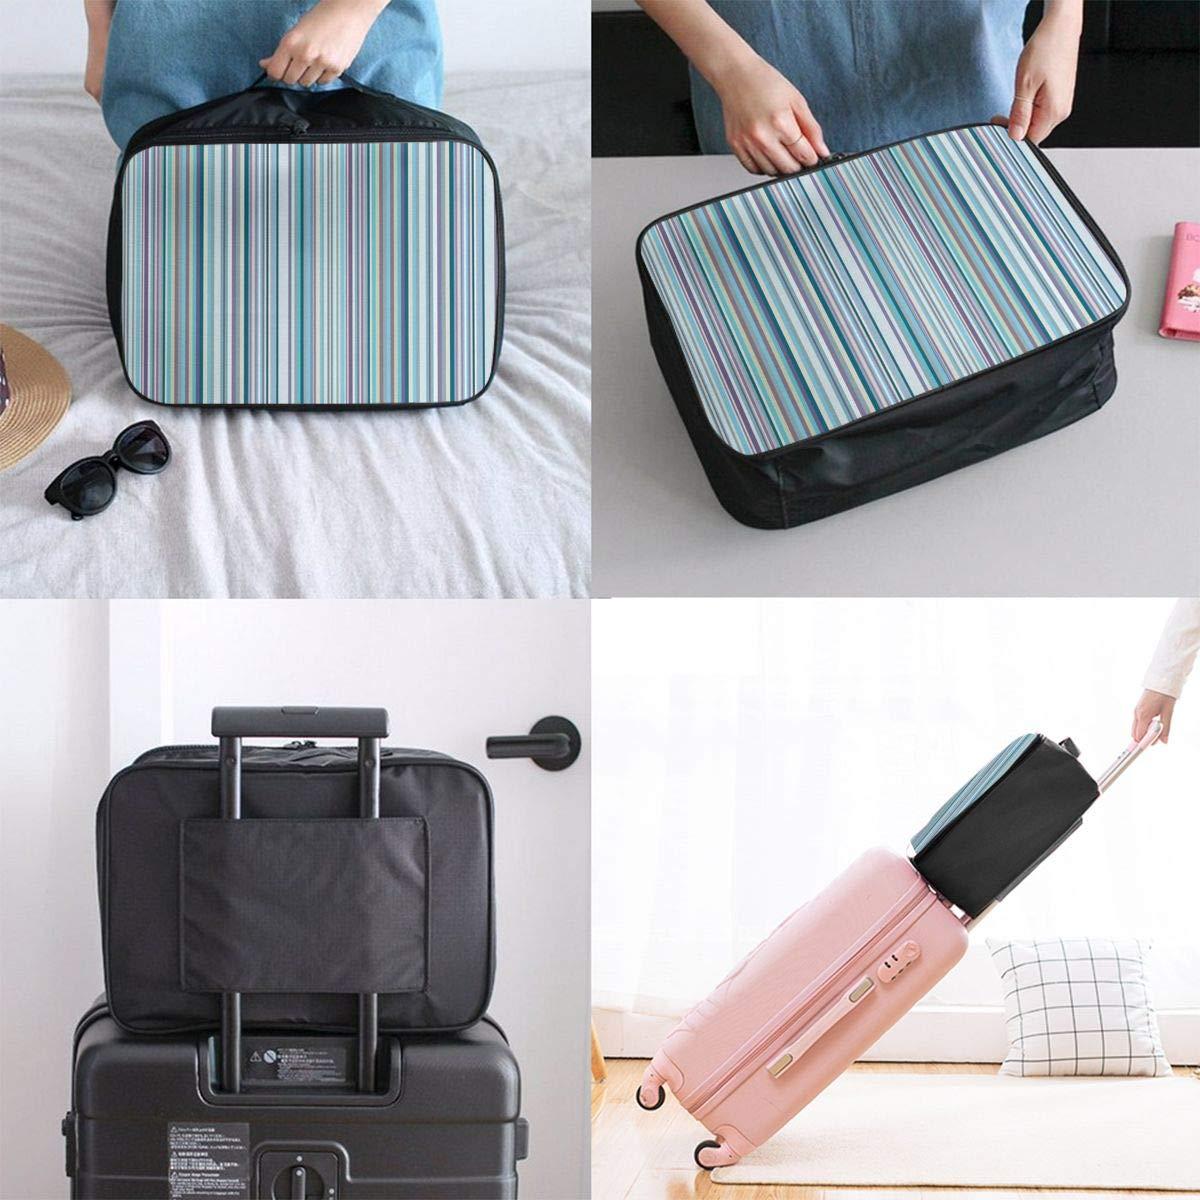 ADGAI Vertical Stripes Canvas Travel Weekender Bag,Fashion Custom Lightweight Large Capacity Portable Luggage Bag,Suitcase Trolley Bag